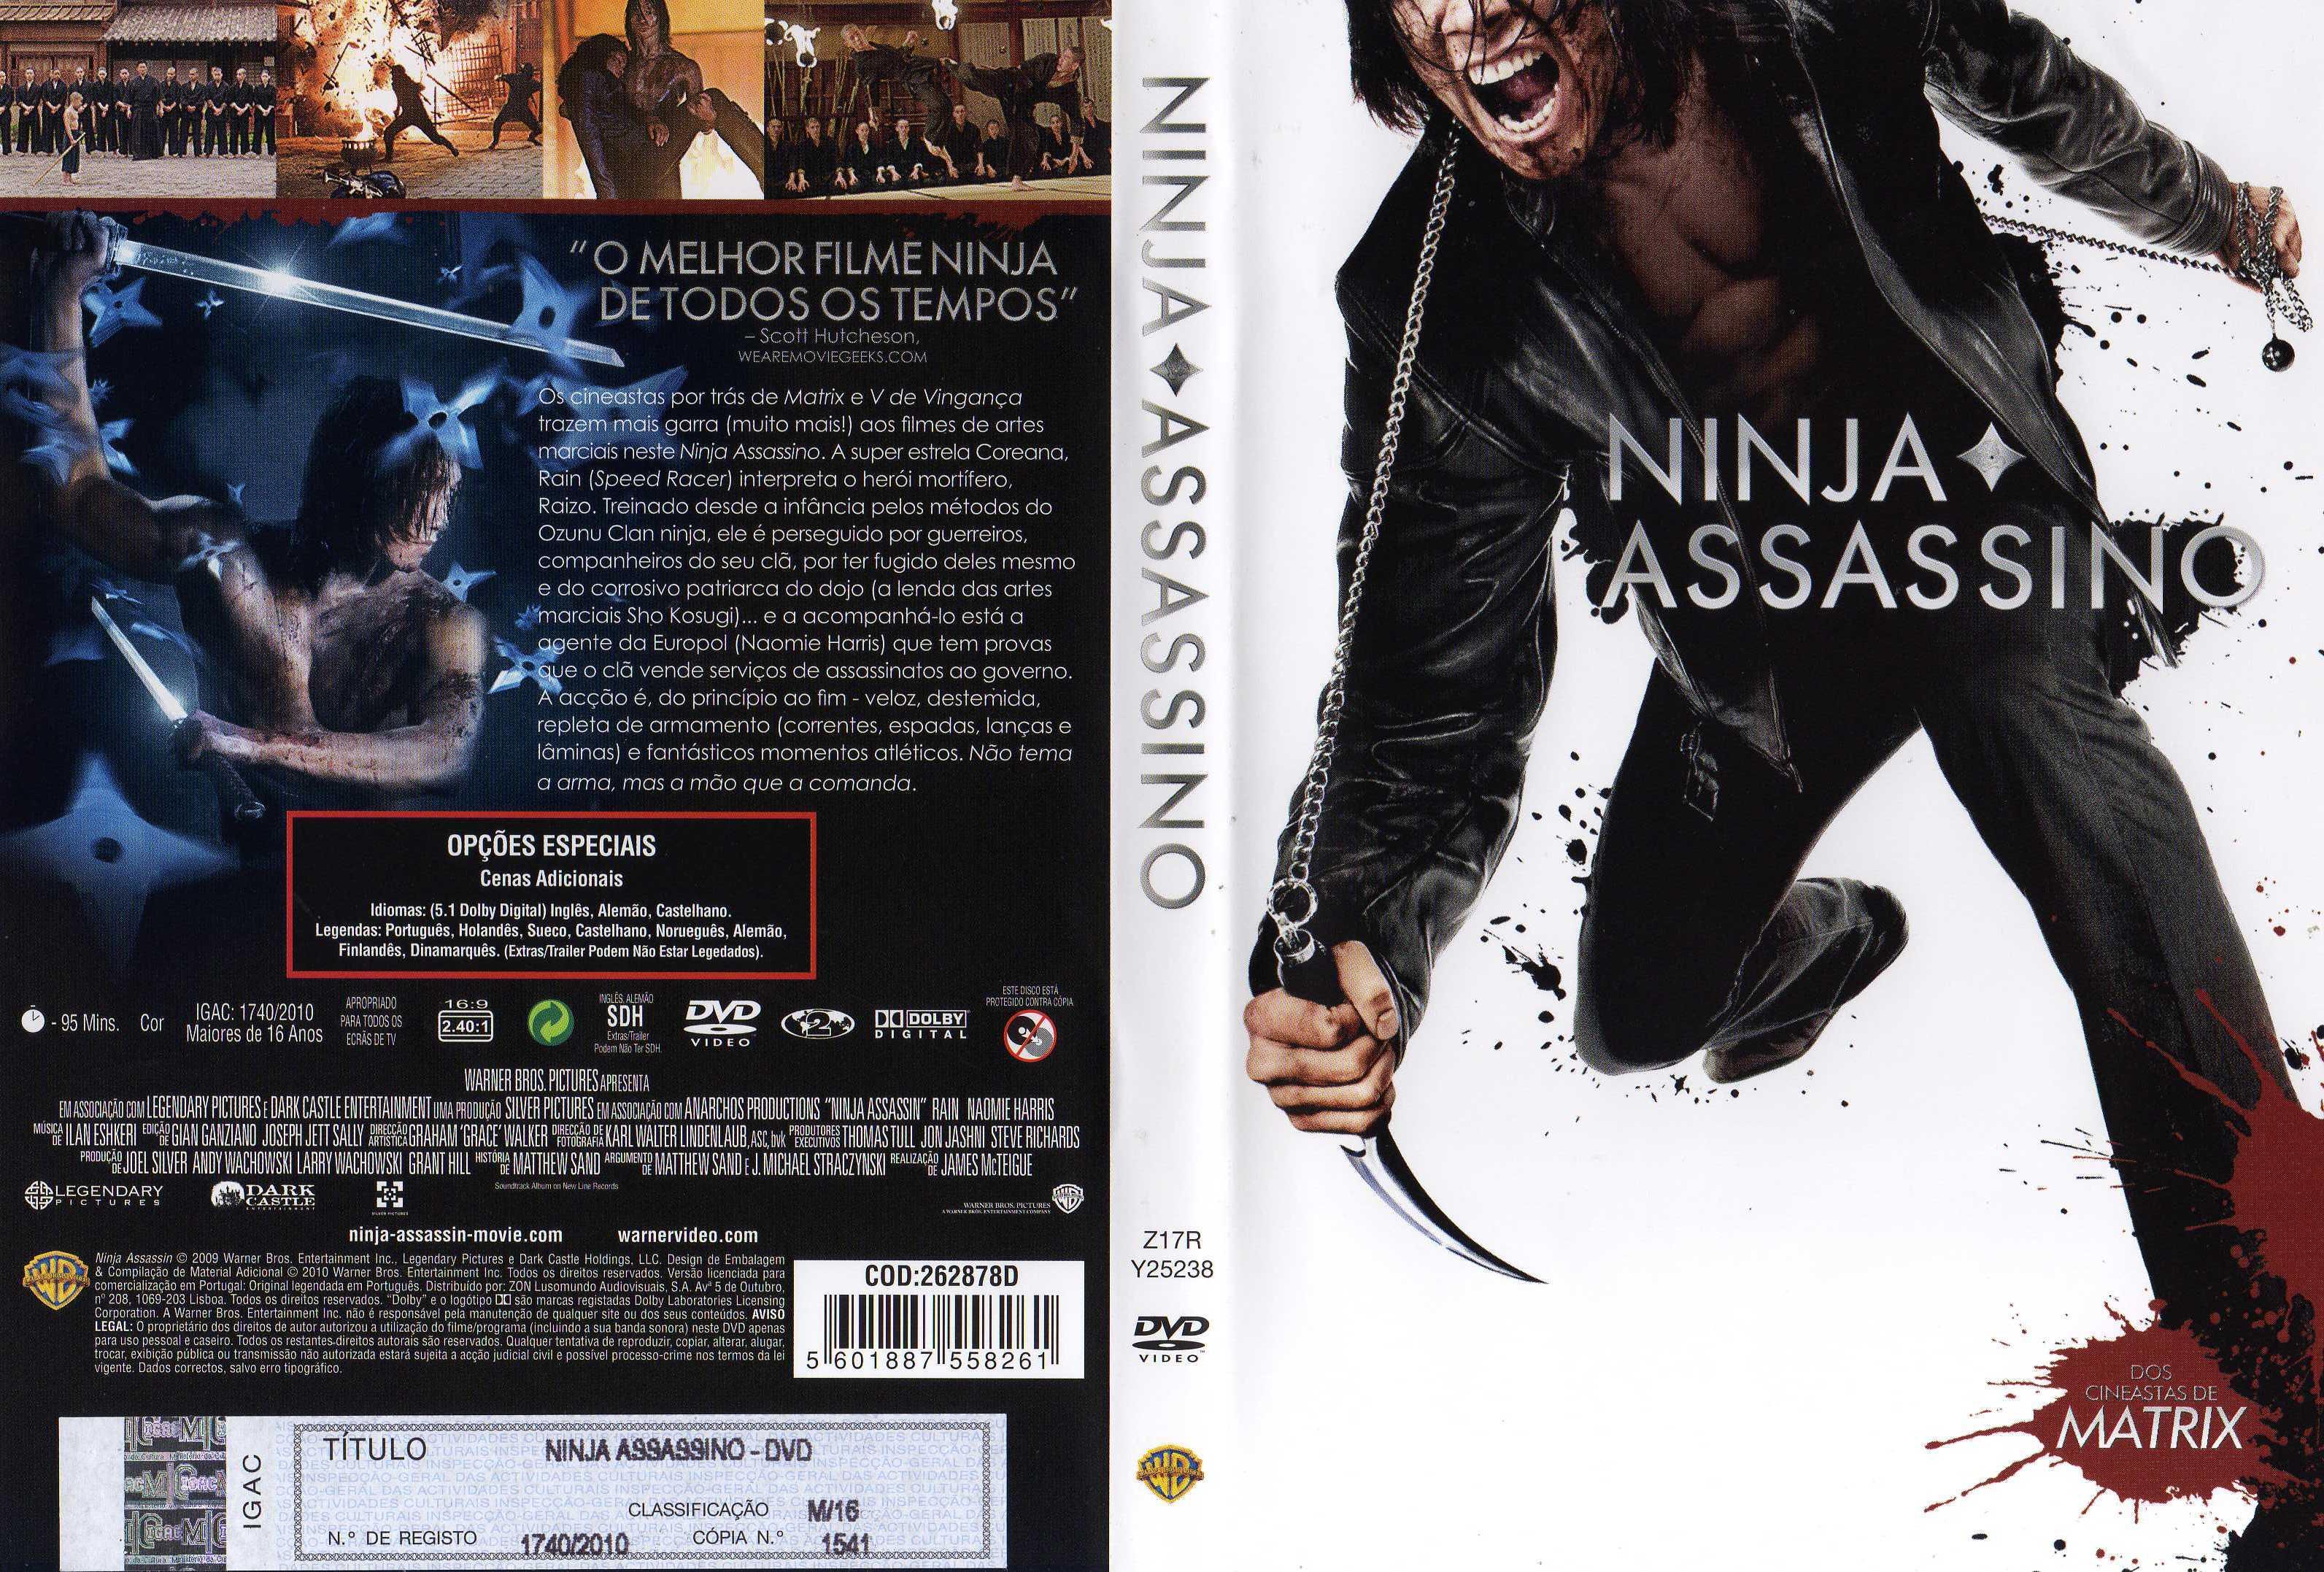 NinjaAssassino